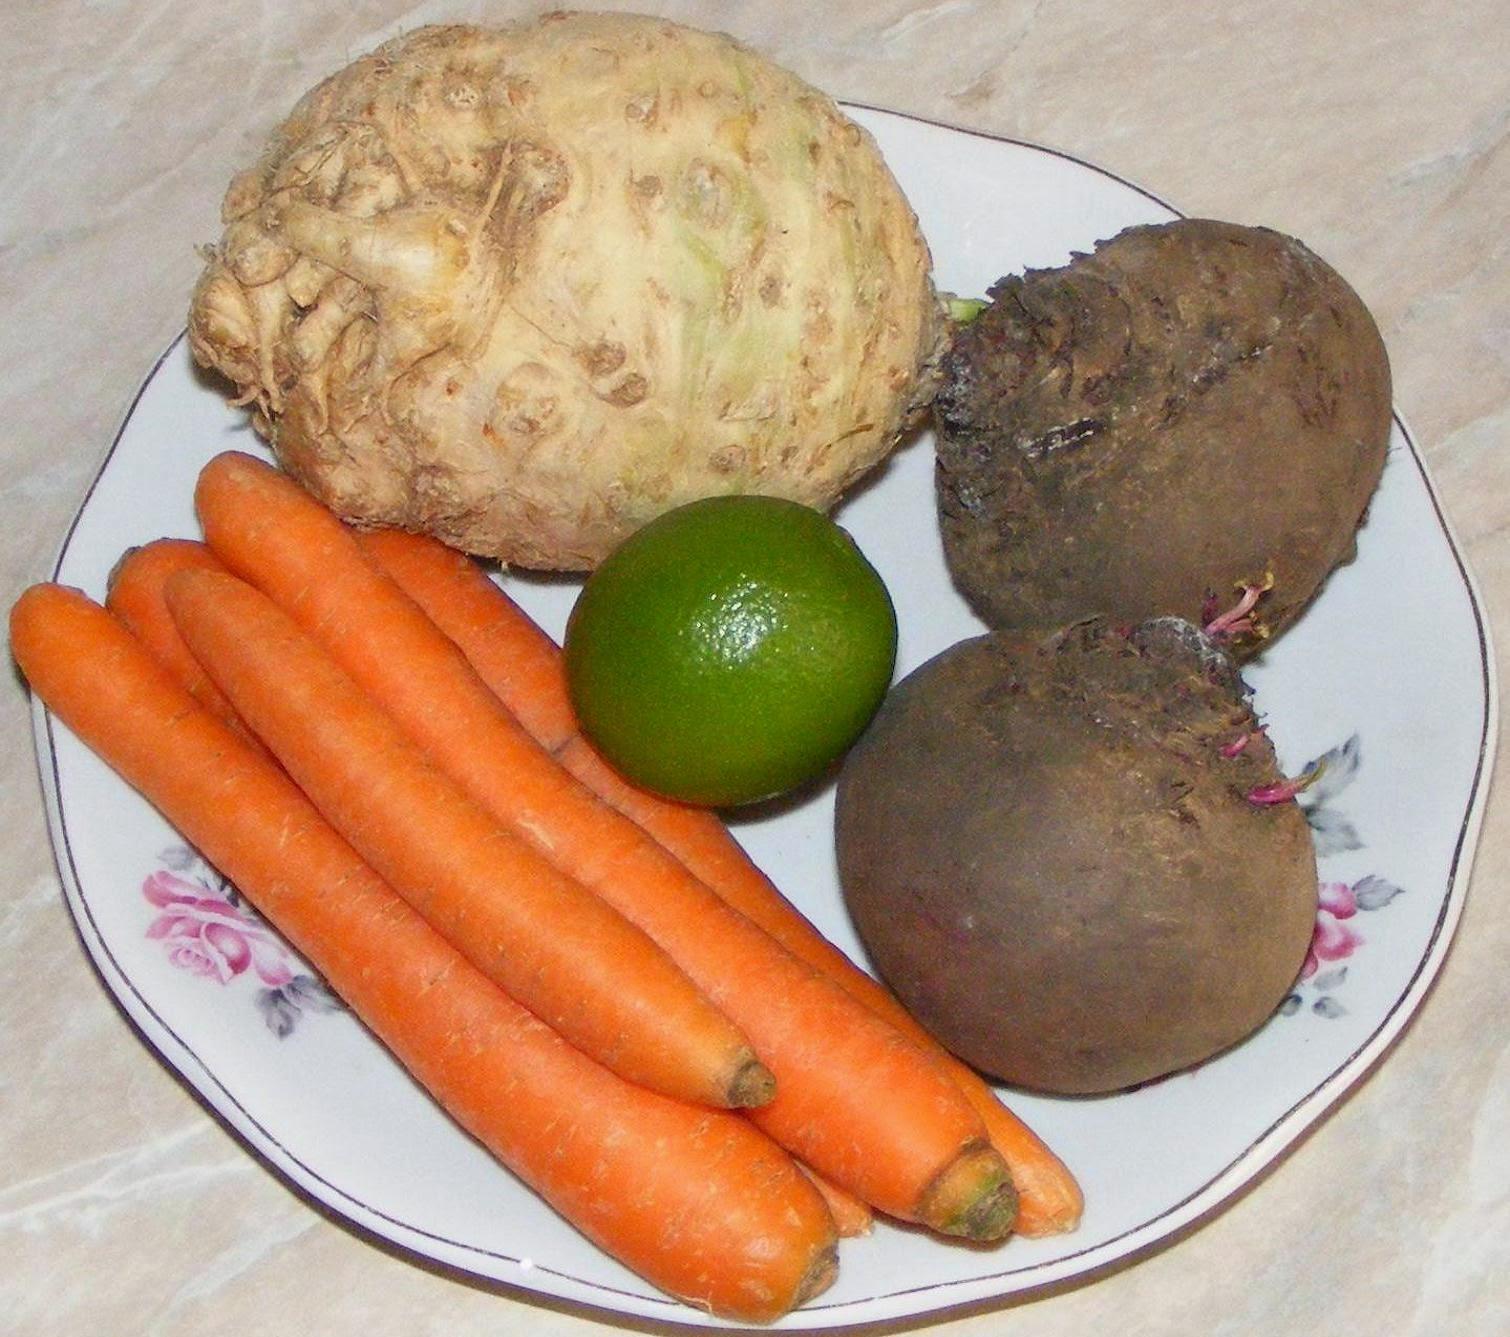 ingrediente suc la blender, legume proaspete, legume pentru suc, legume pentru suc la blender, preparare suc de legume la blender, morcov pentru suc, telina pentru suc, sfecla rosie pentru suc, reteta suc la blender, reteta suc la blender,